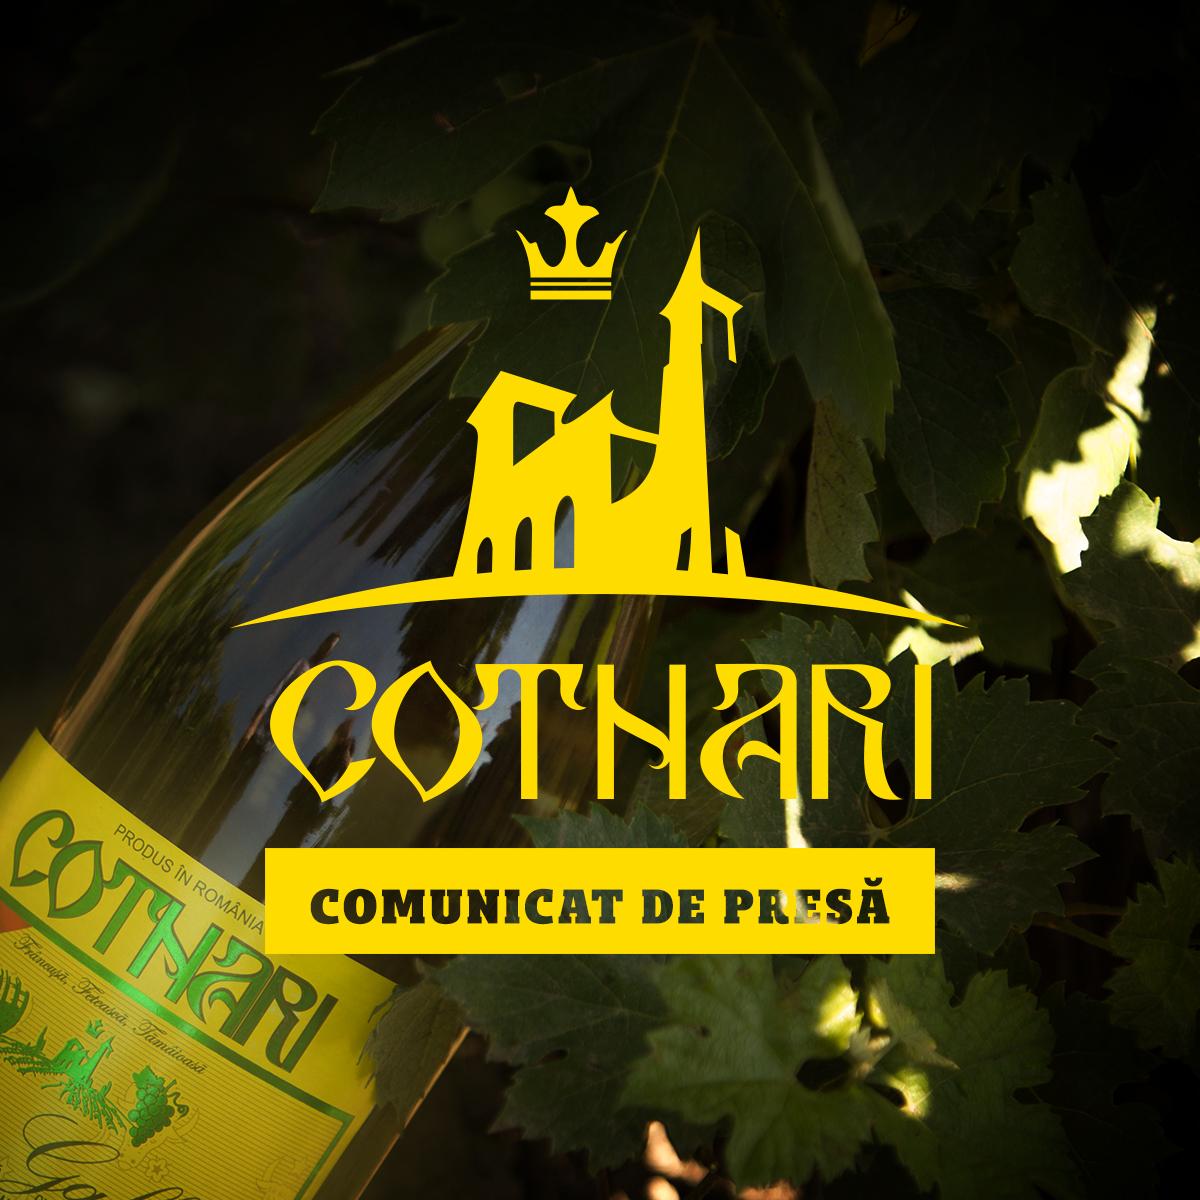 https://www.cotnari.ro/continut/uploads/2017/08/comunicat2.jpg